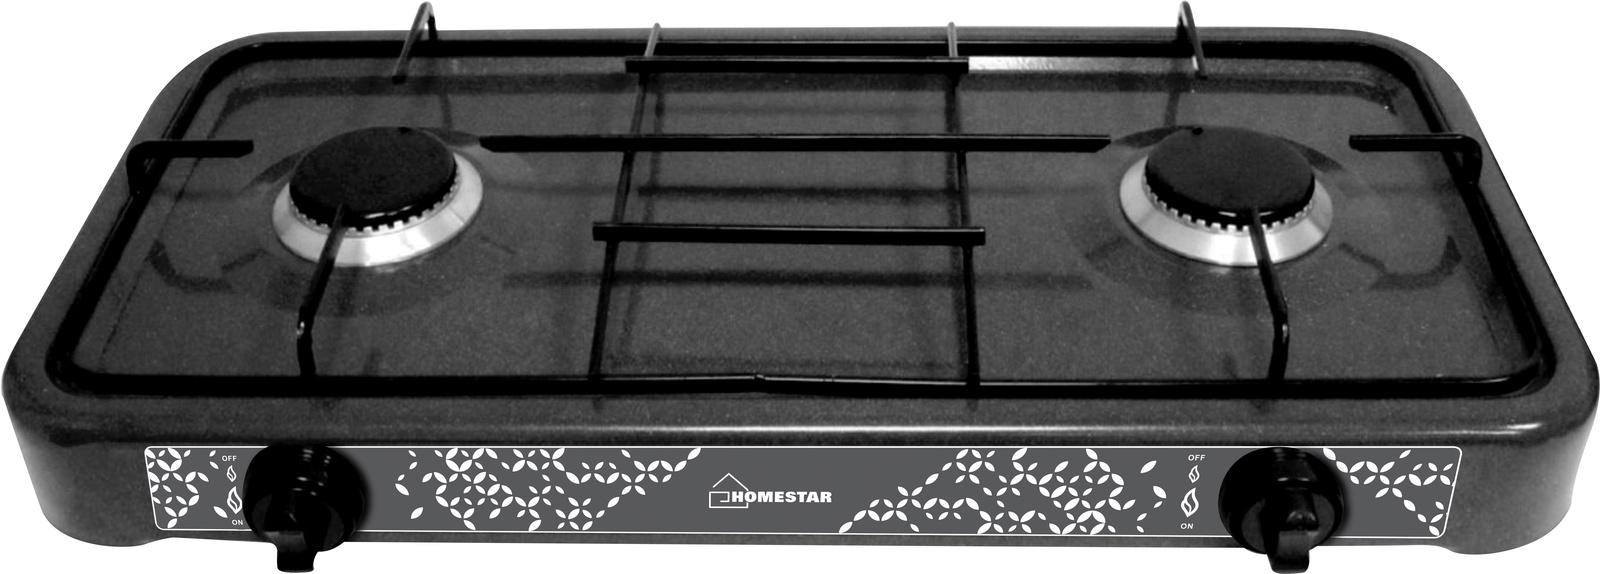 лучшая цена Настольная плита HOMESTAR HS-1202, 54 003699, черный